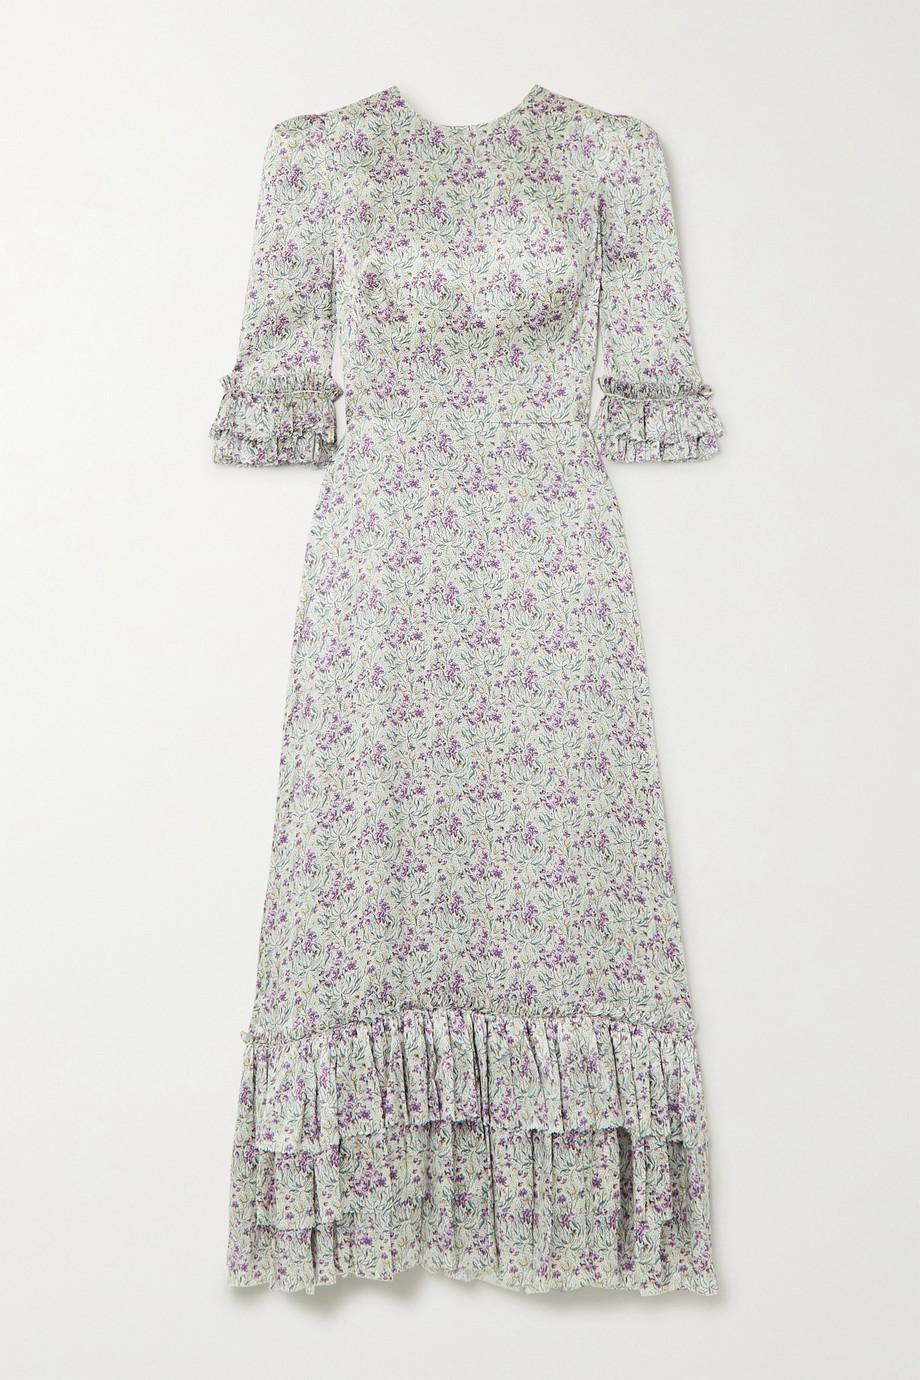 The Vampire's Wife Cinderella ruffled floral-print silk-satin maxi dress